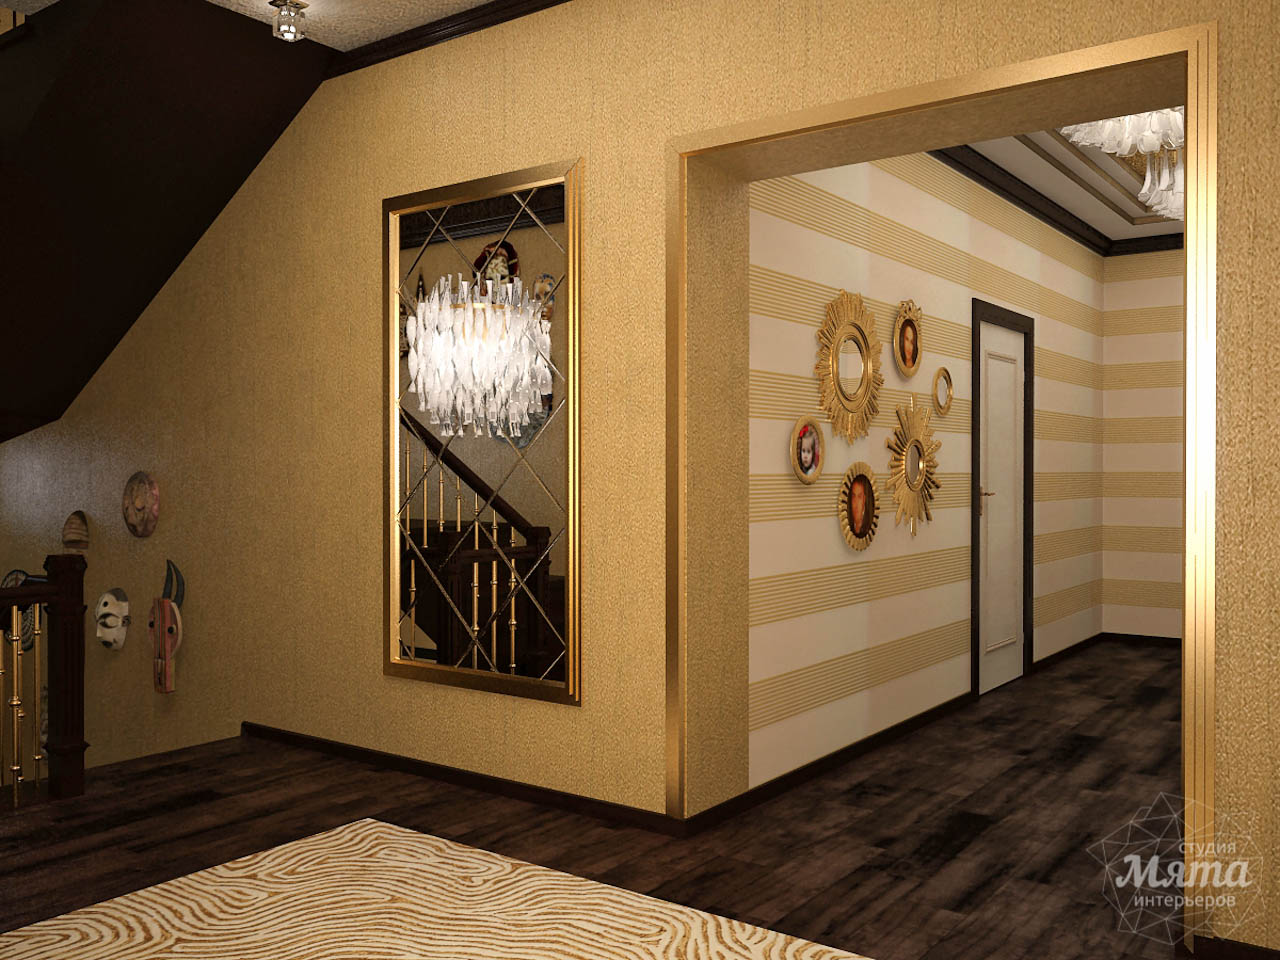 Дизайн интерьера коттеджа по ул. Ландышевая 23 img1618001062